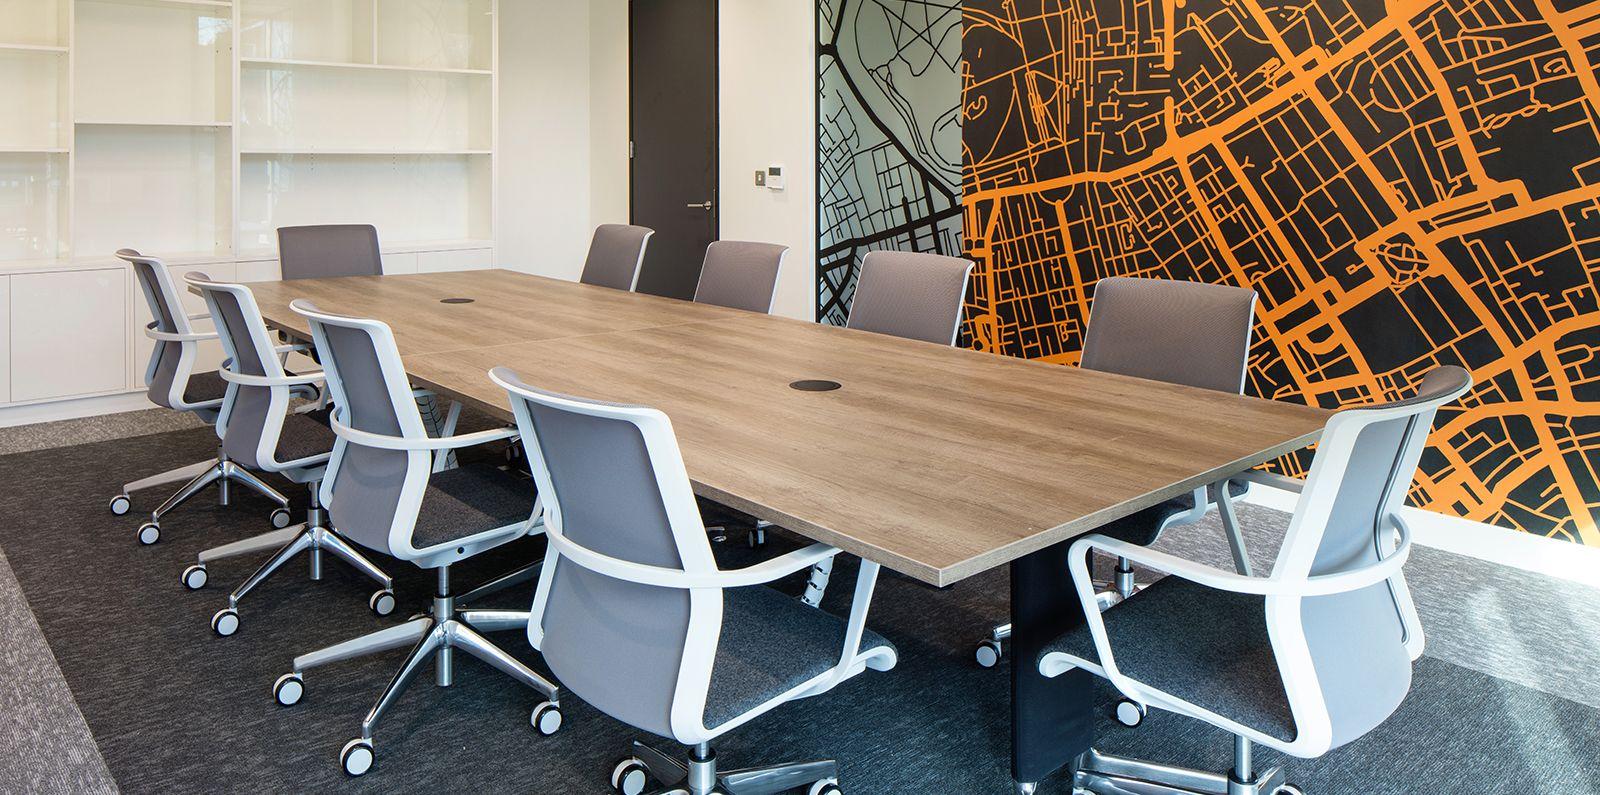 Meetingspaces Office Senator Workplace Design Architecture